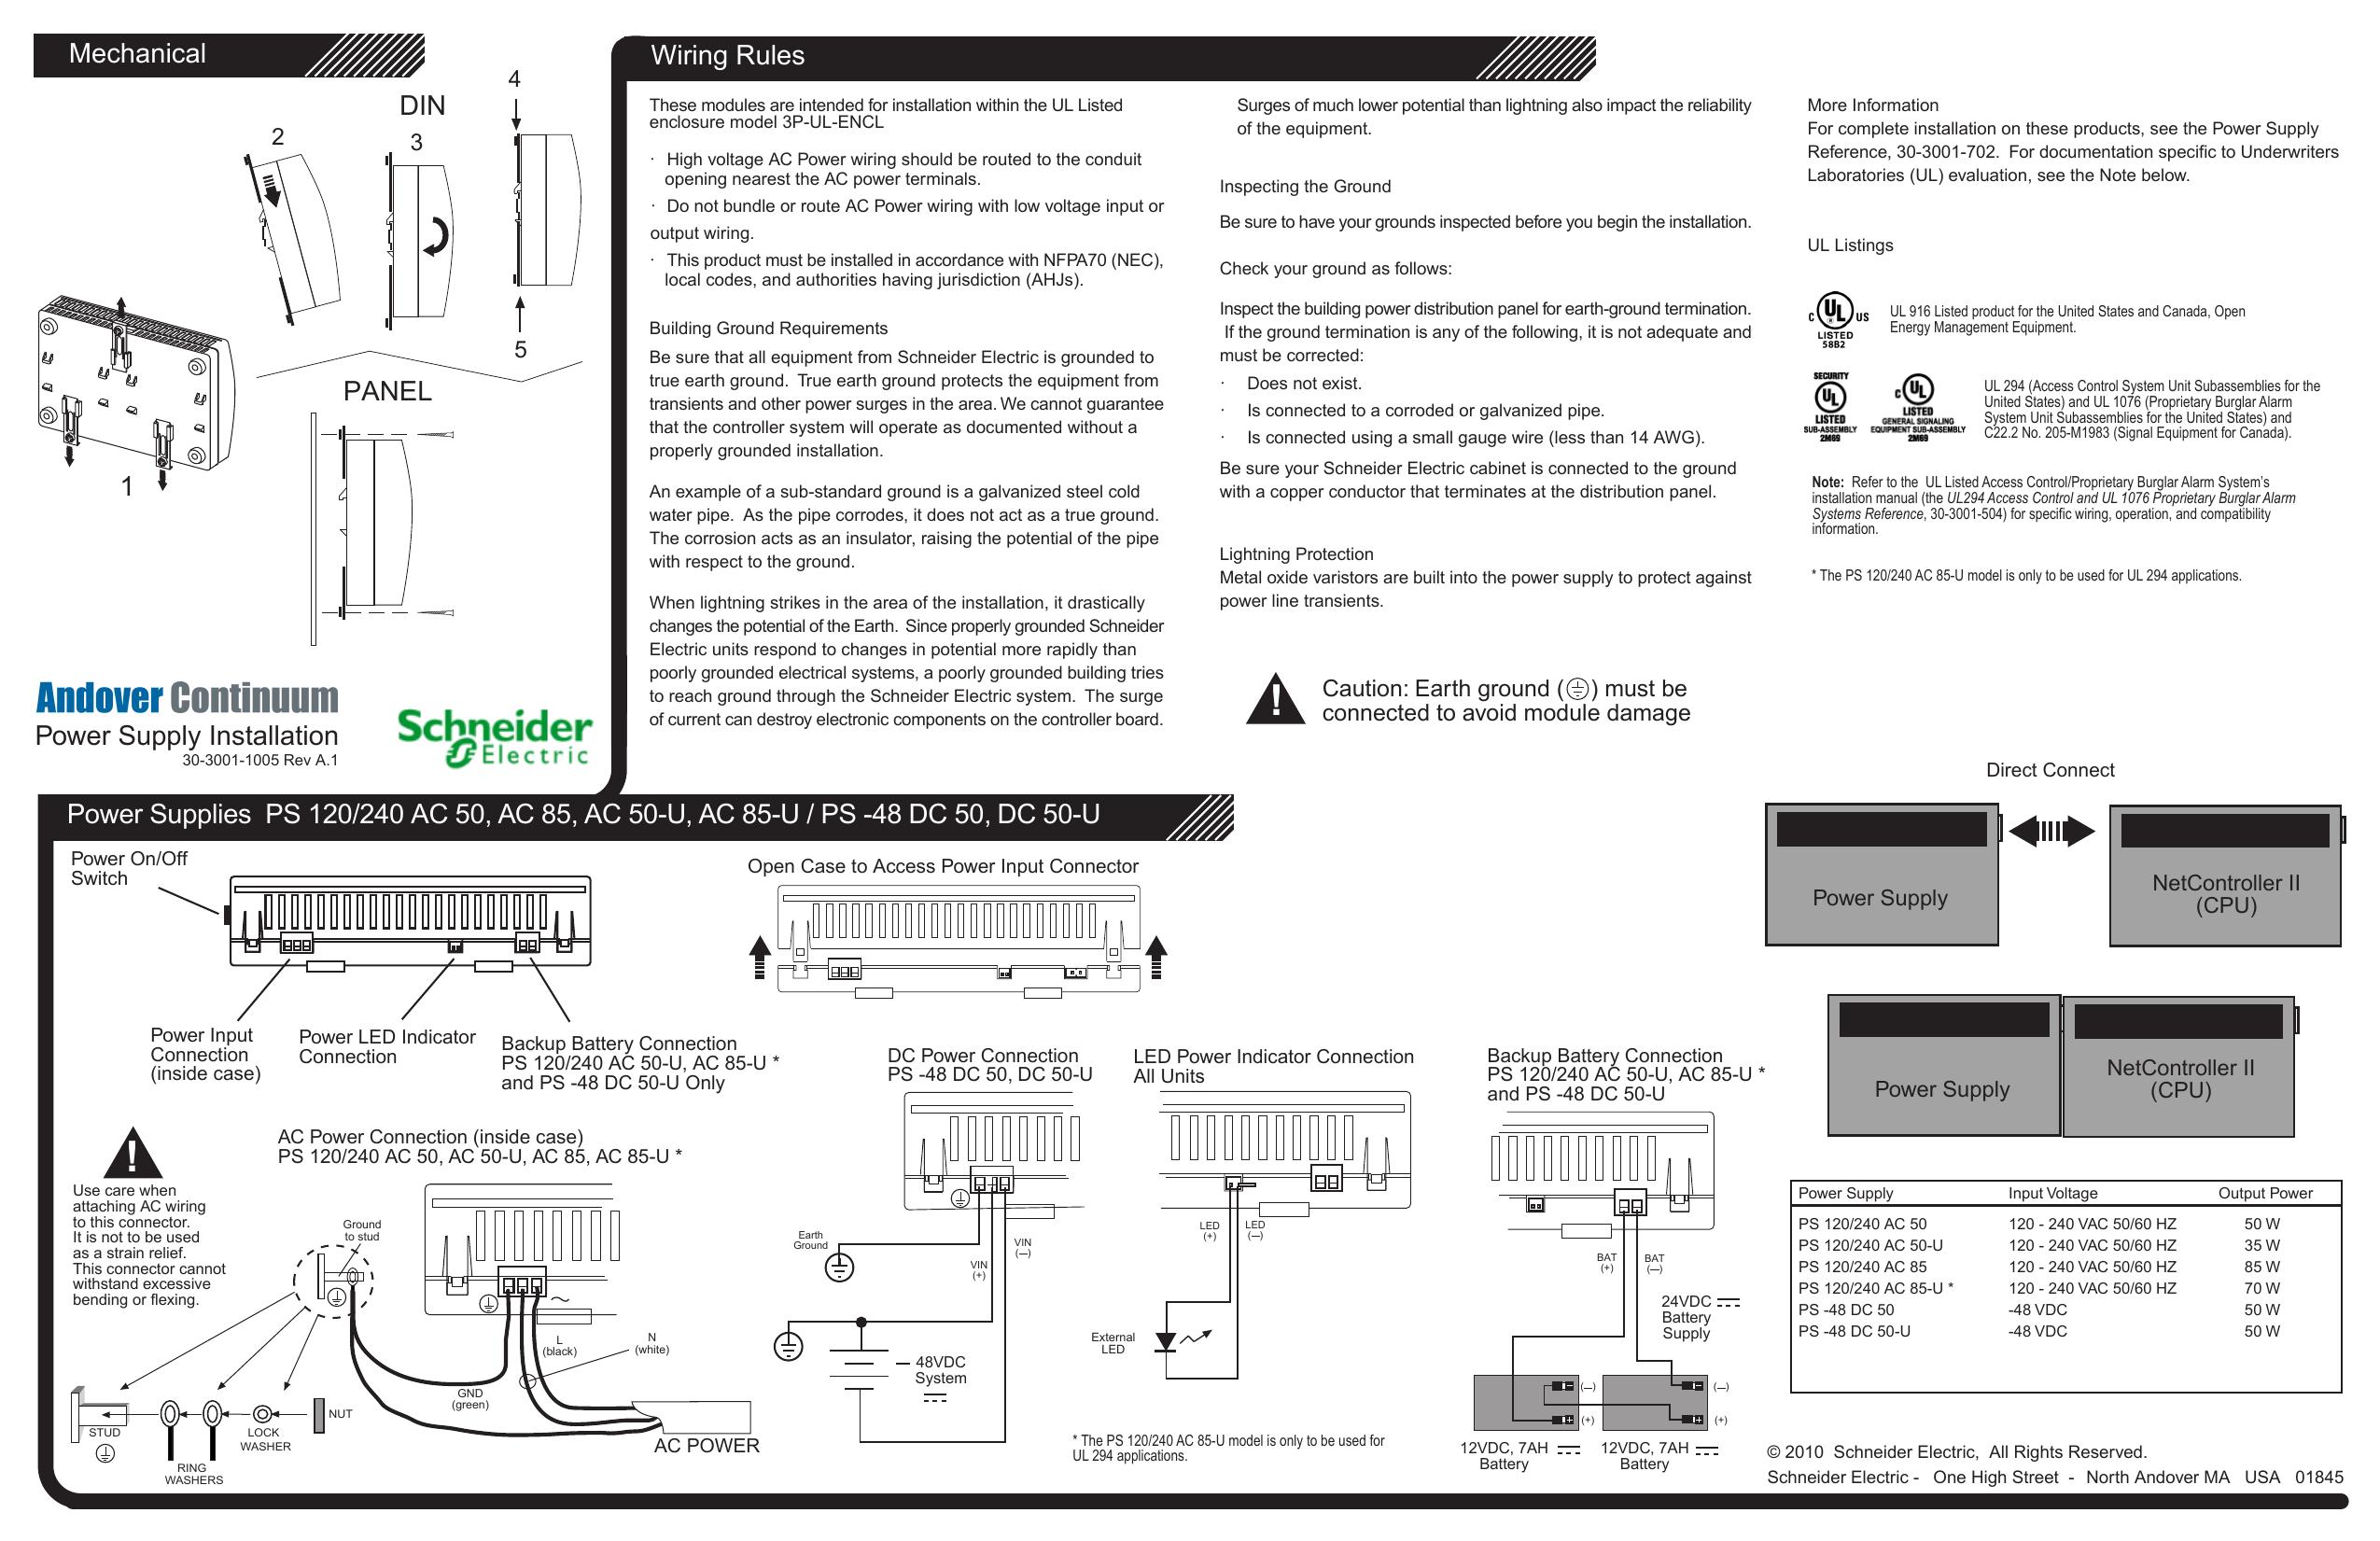 240 ac wiring power supply installation 1 mechanical din panel wiring rules  power supply installation 1 mechanical